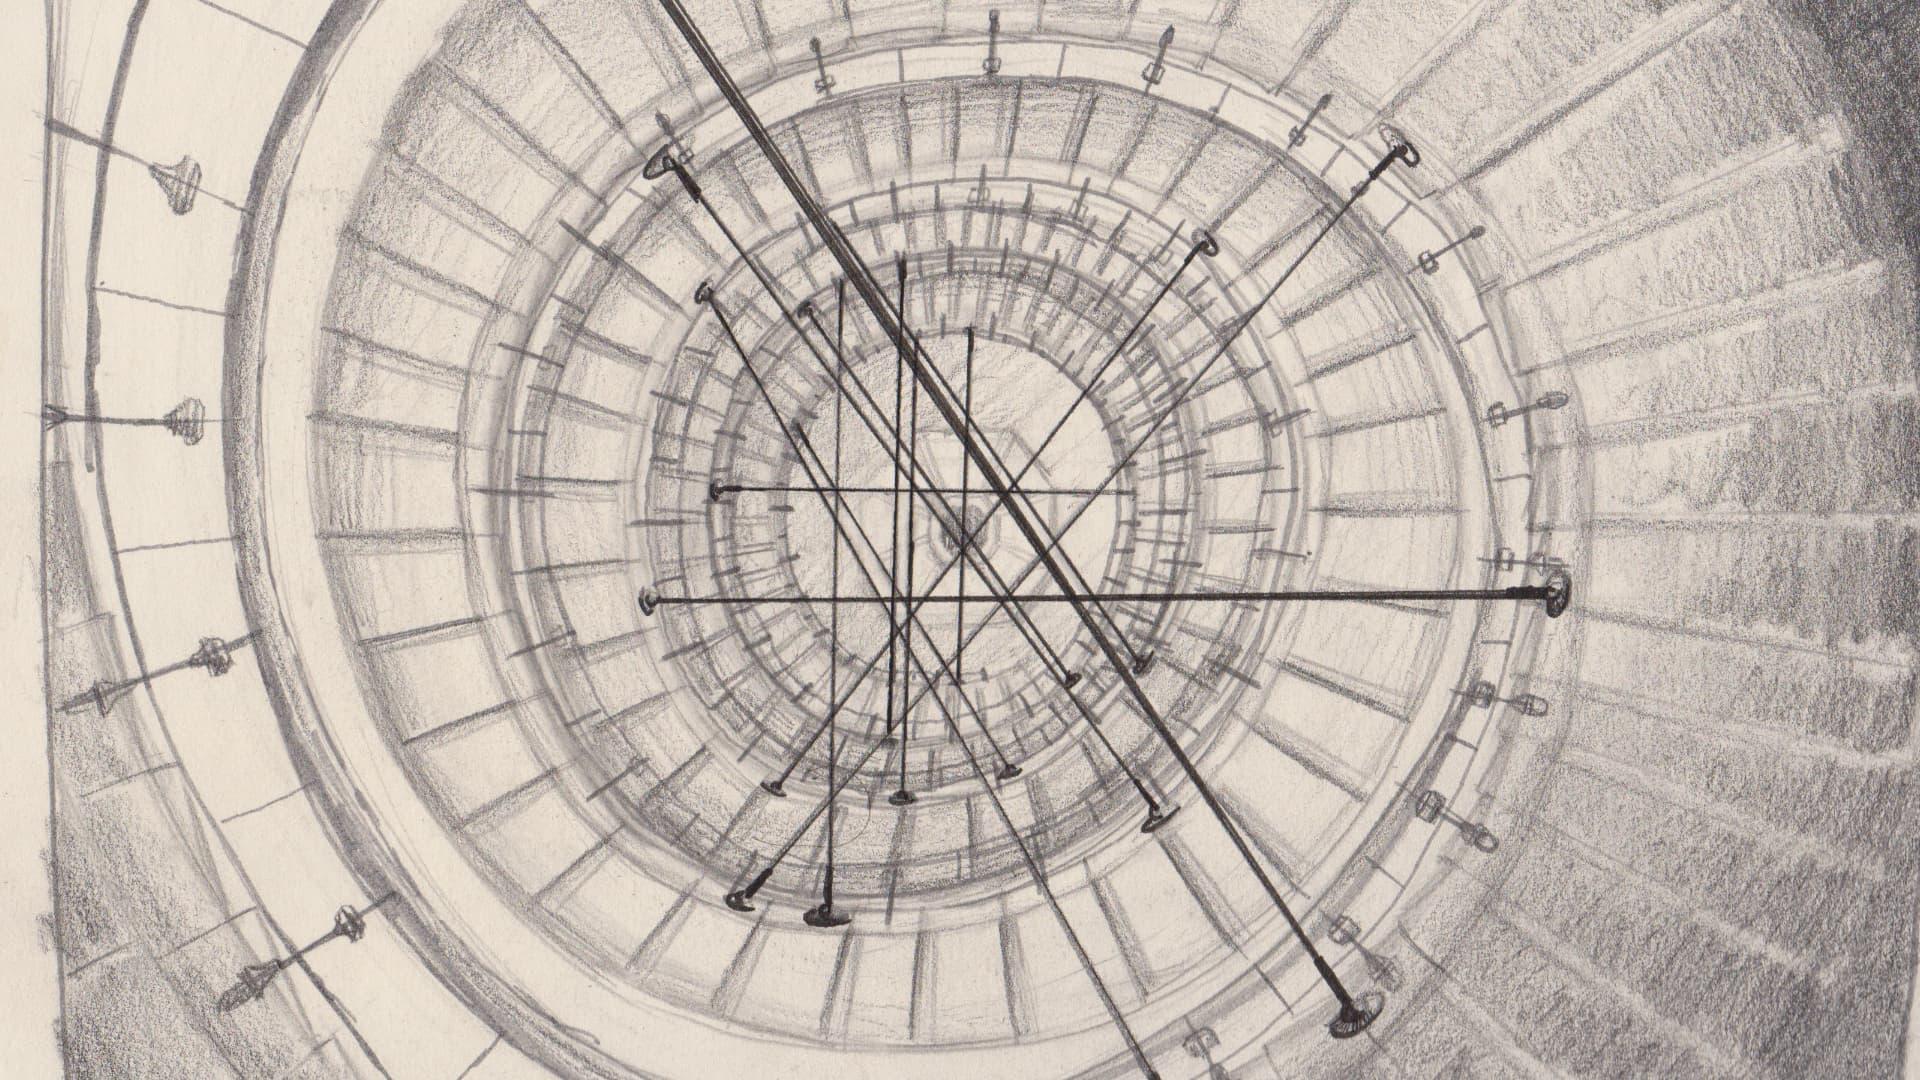 nyx keyshot film process sketch title design logo cables anamorphosis branding